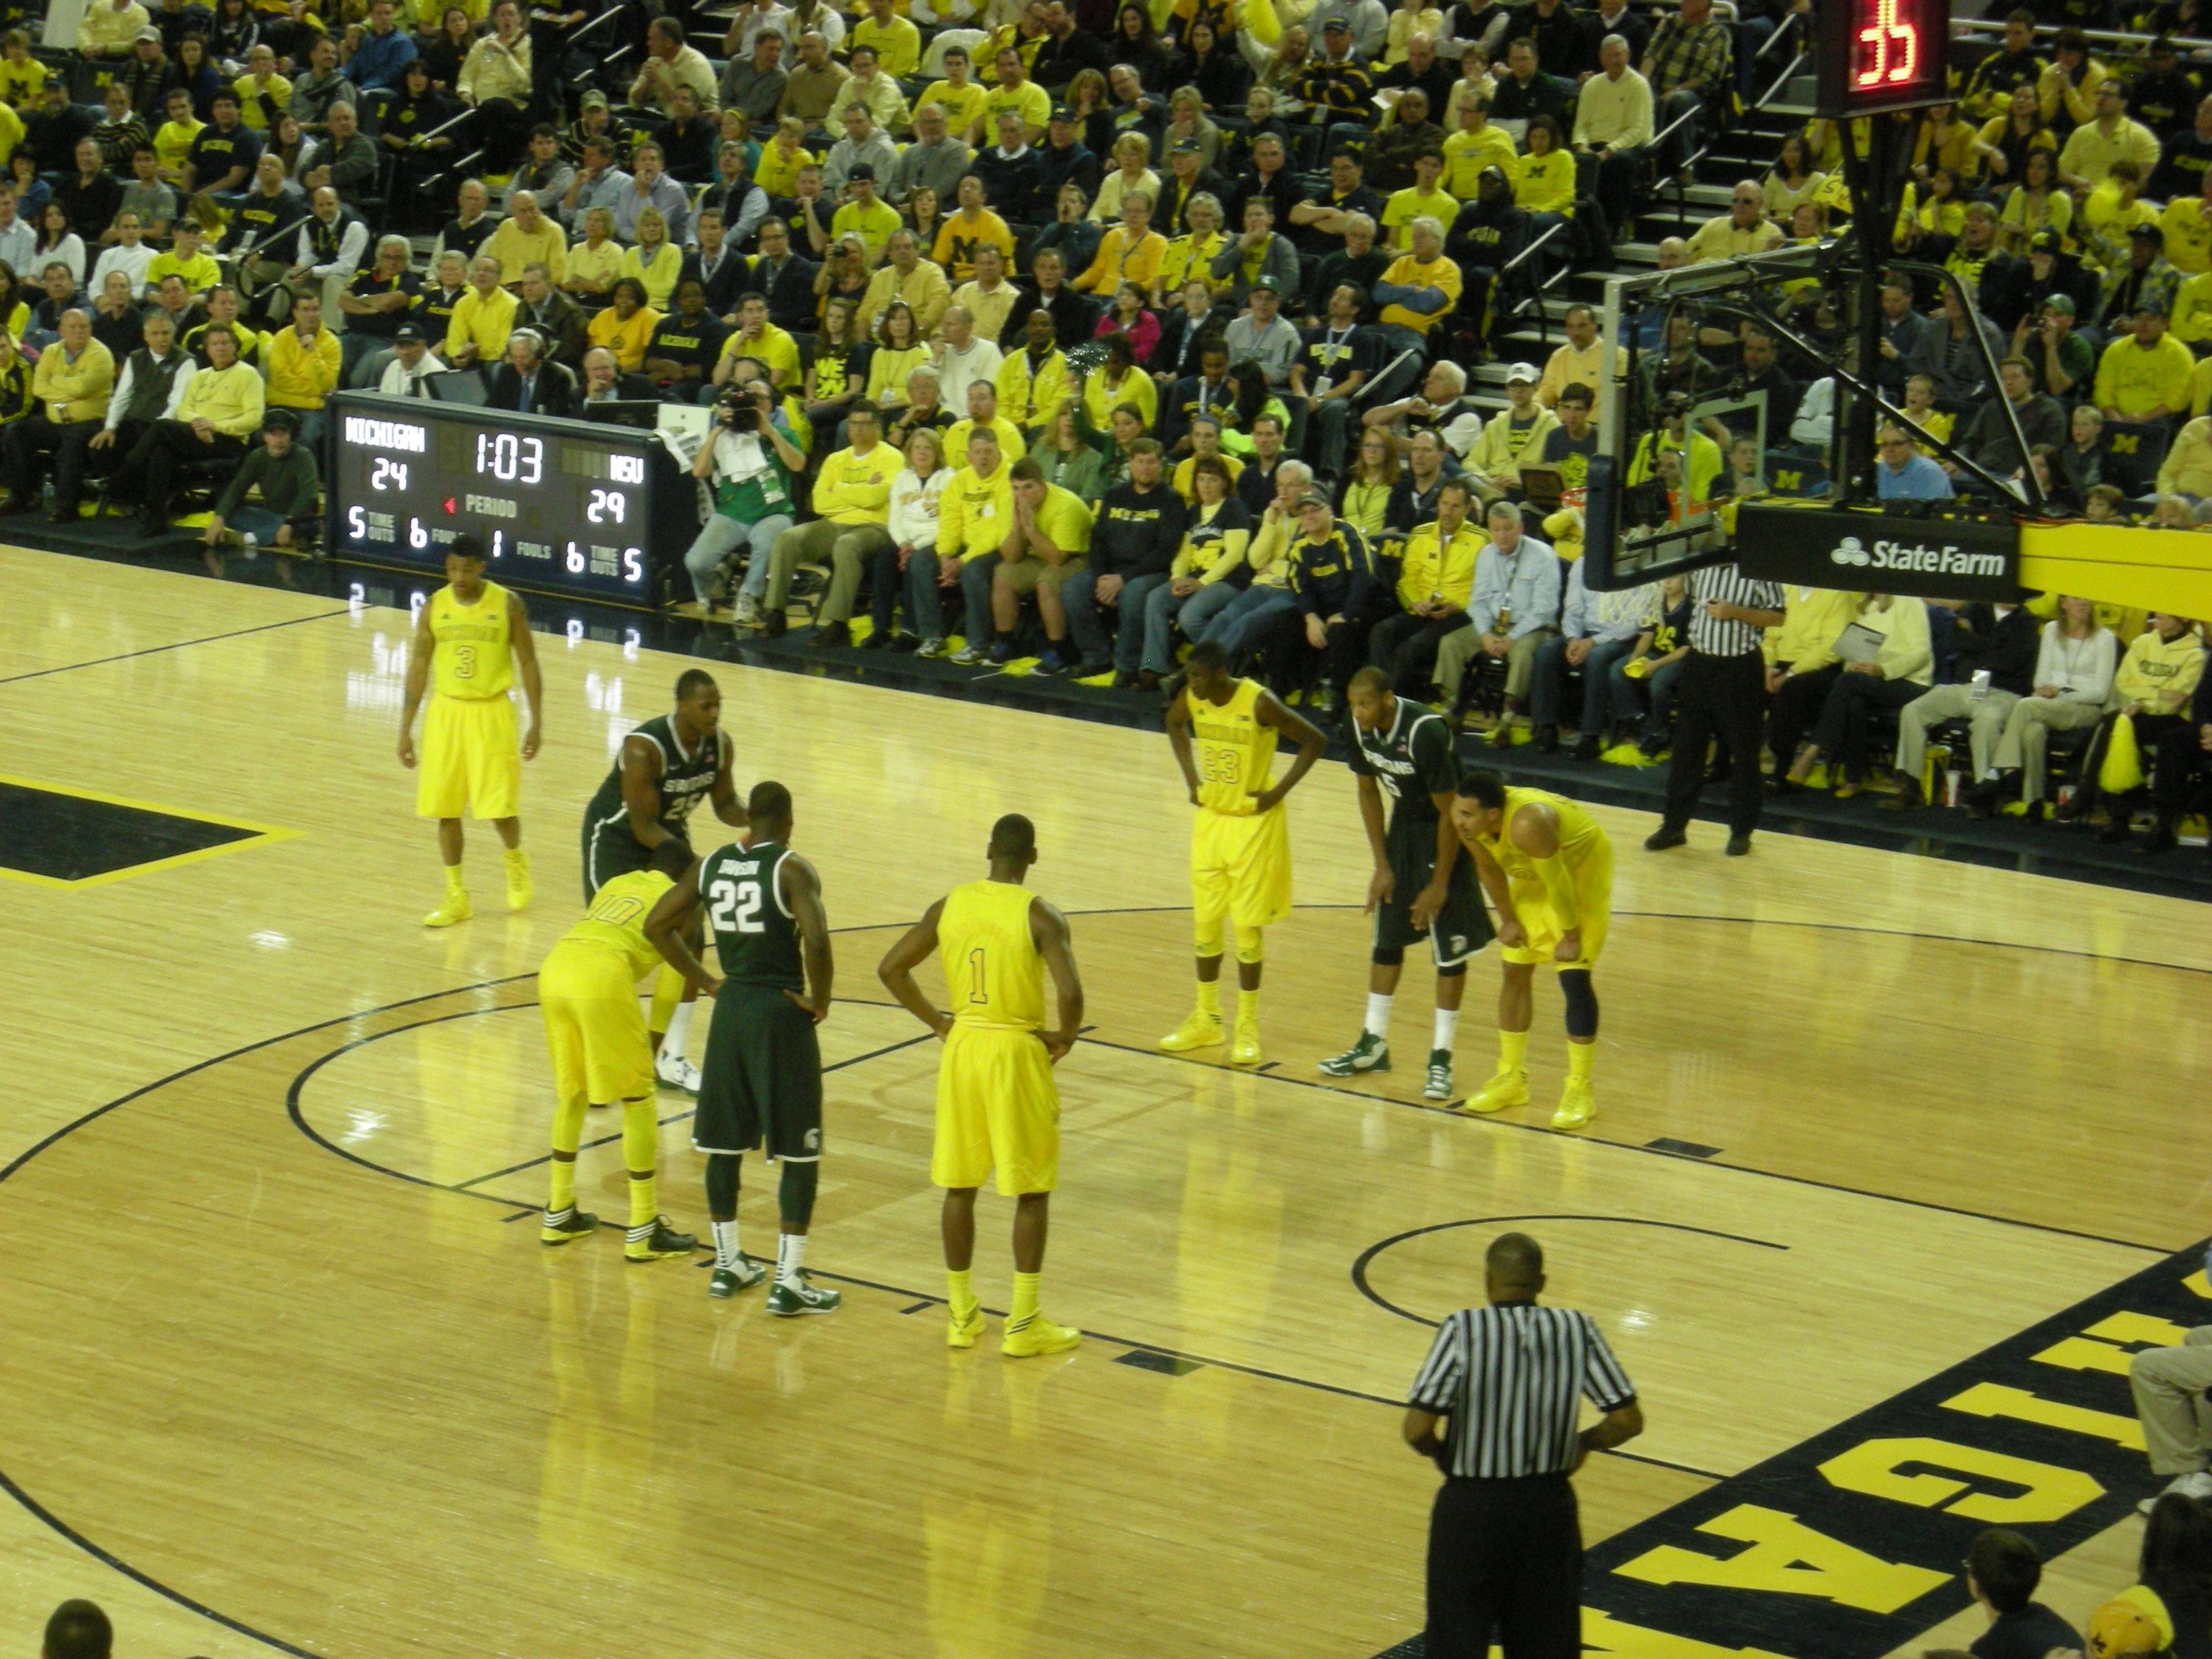 Michigan State vs Michigan mens basketball 2013 09 in game action 3072x2304